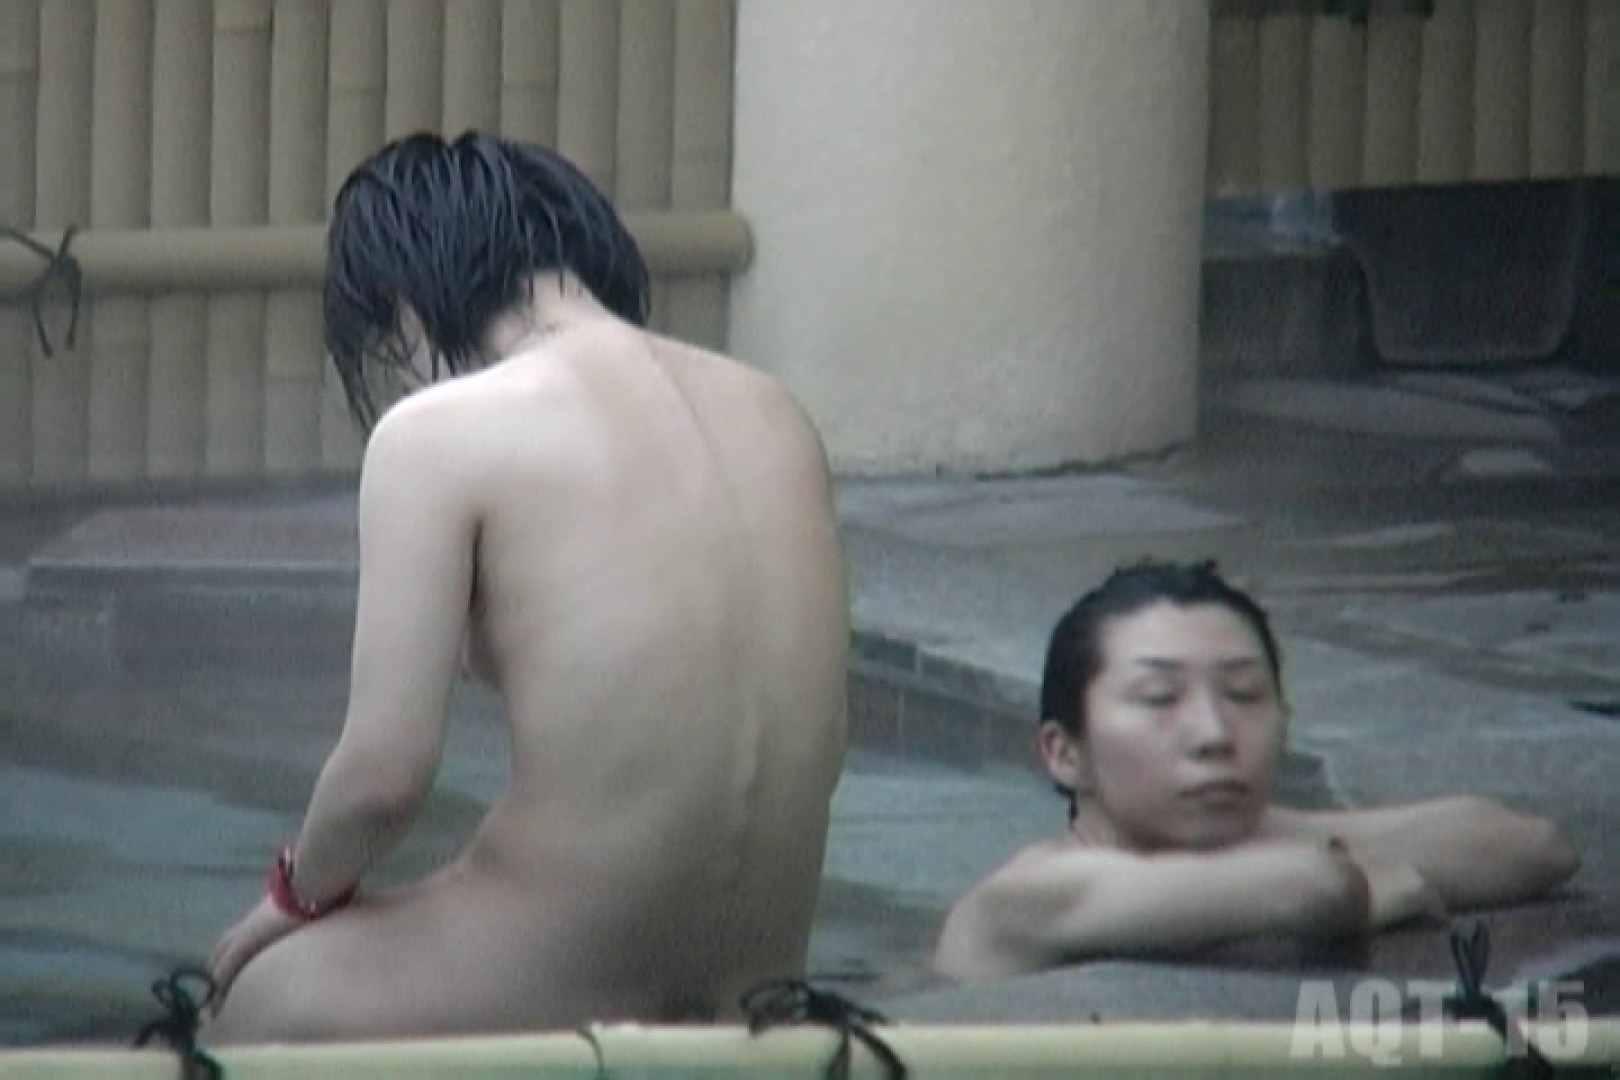 Aquaな露天風呂Vol.837 盗撮映像  107Pix 18